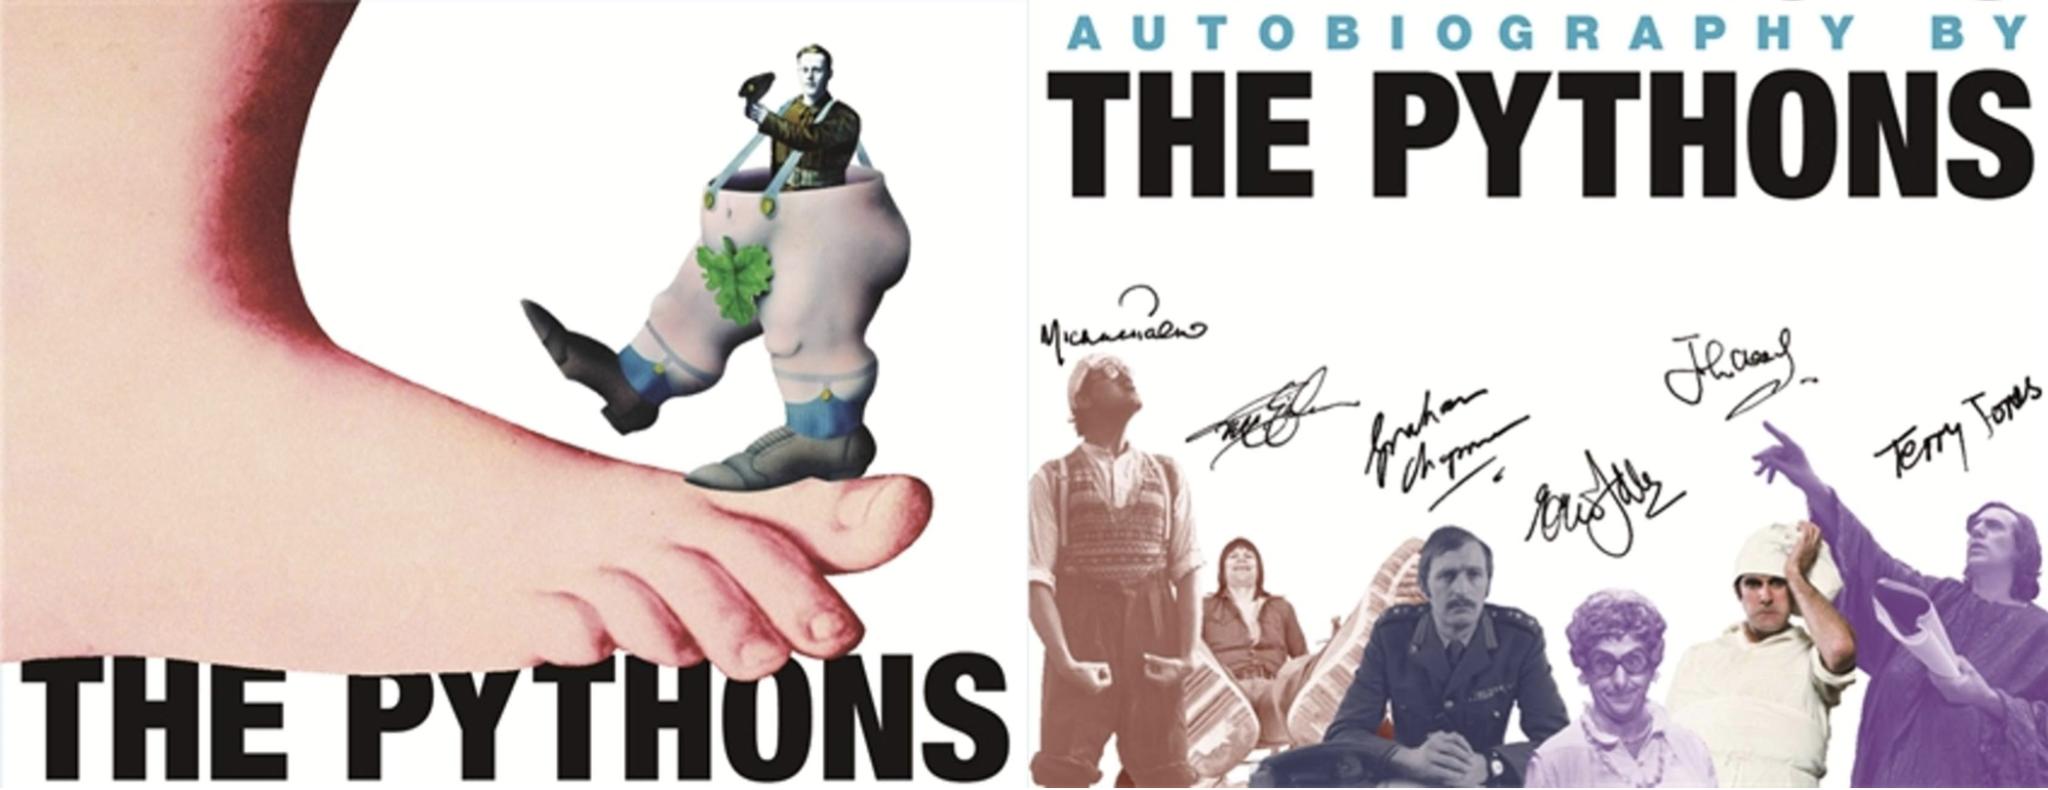 Monty Python on Monty Python -the Pythons' Autobiography By The Pythons - thescriptblog.com